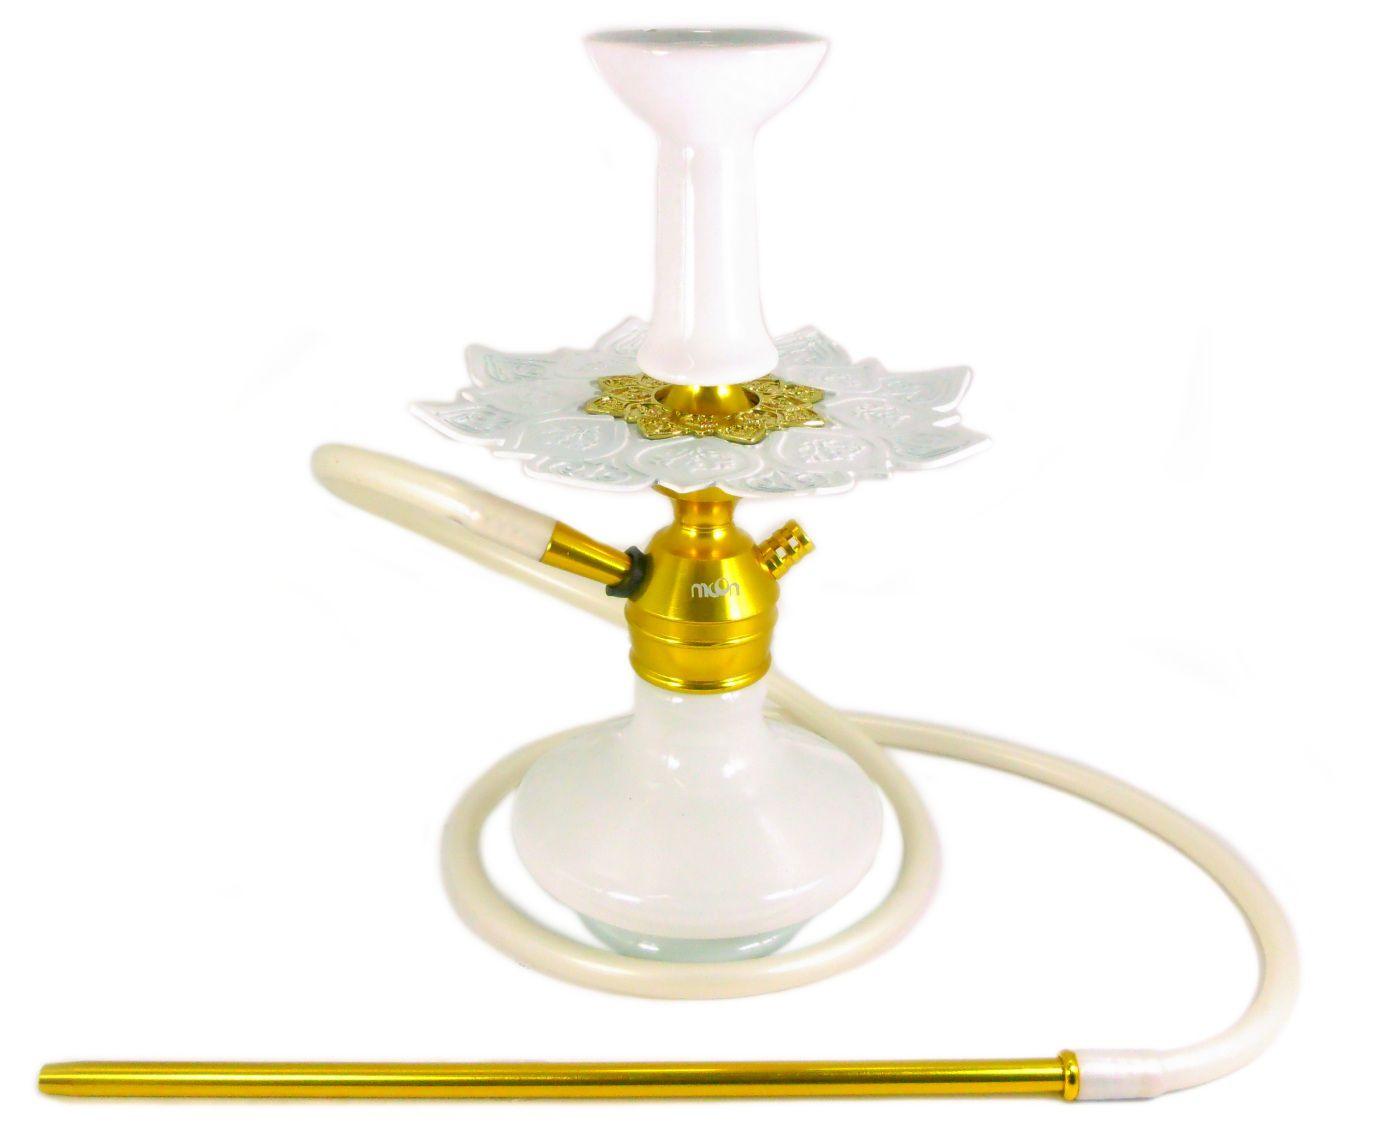 Narguile Moon Dourado, vaso Aladin branco, mang.silicone, piteira alumínio,rosh MD, prato Athenas